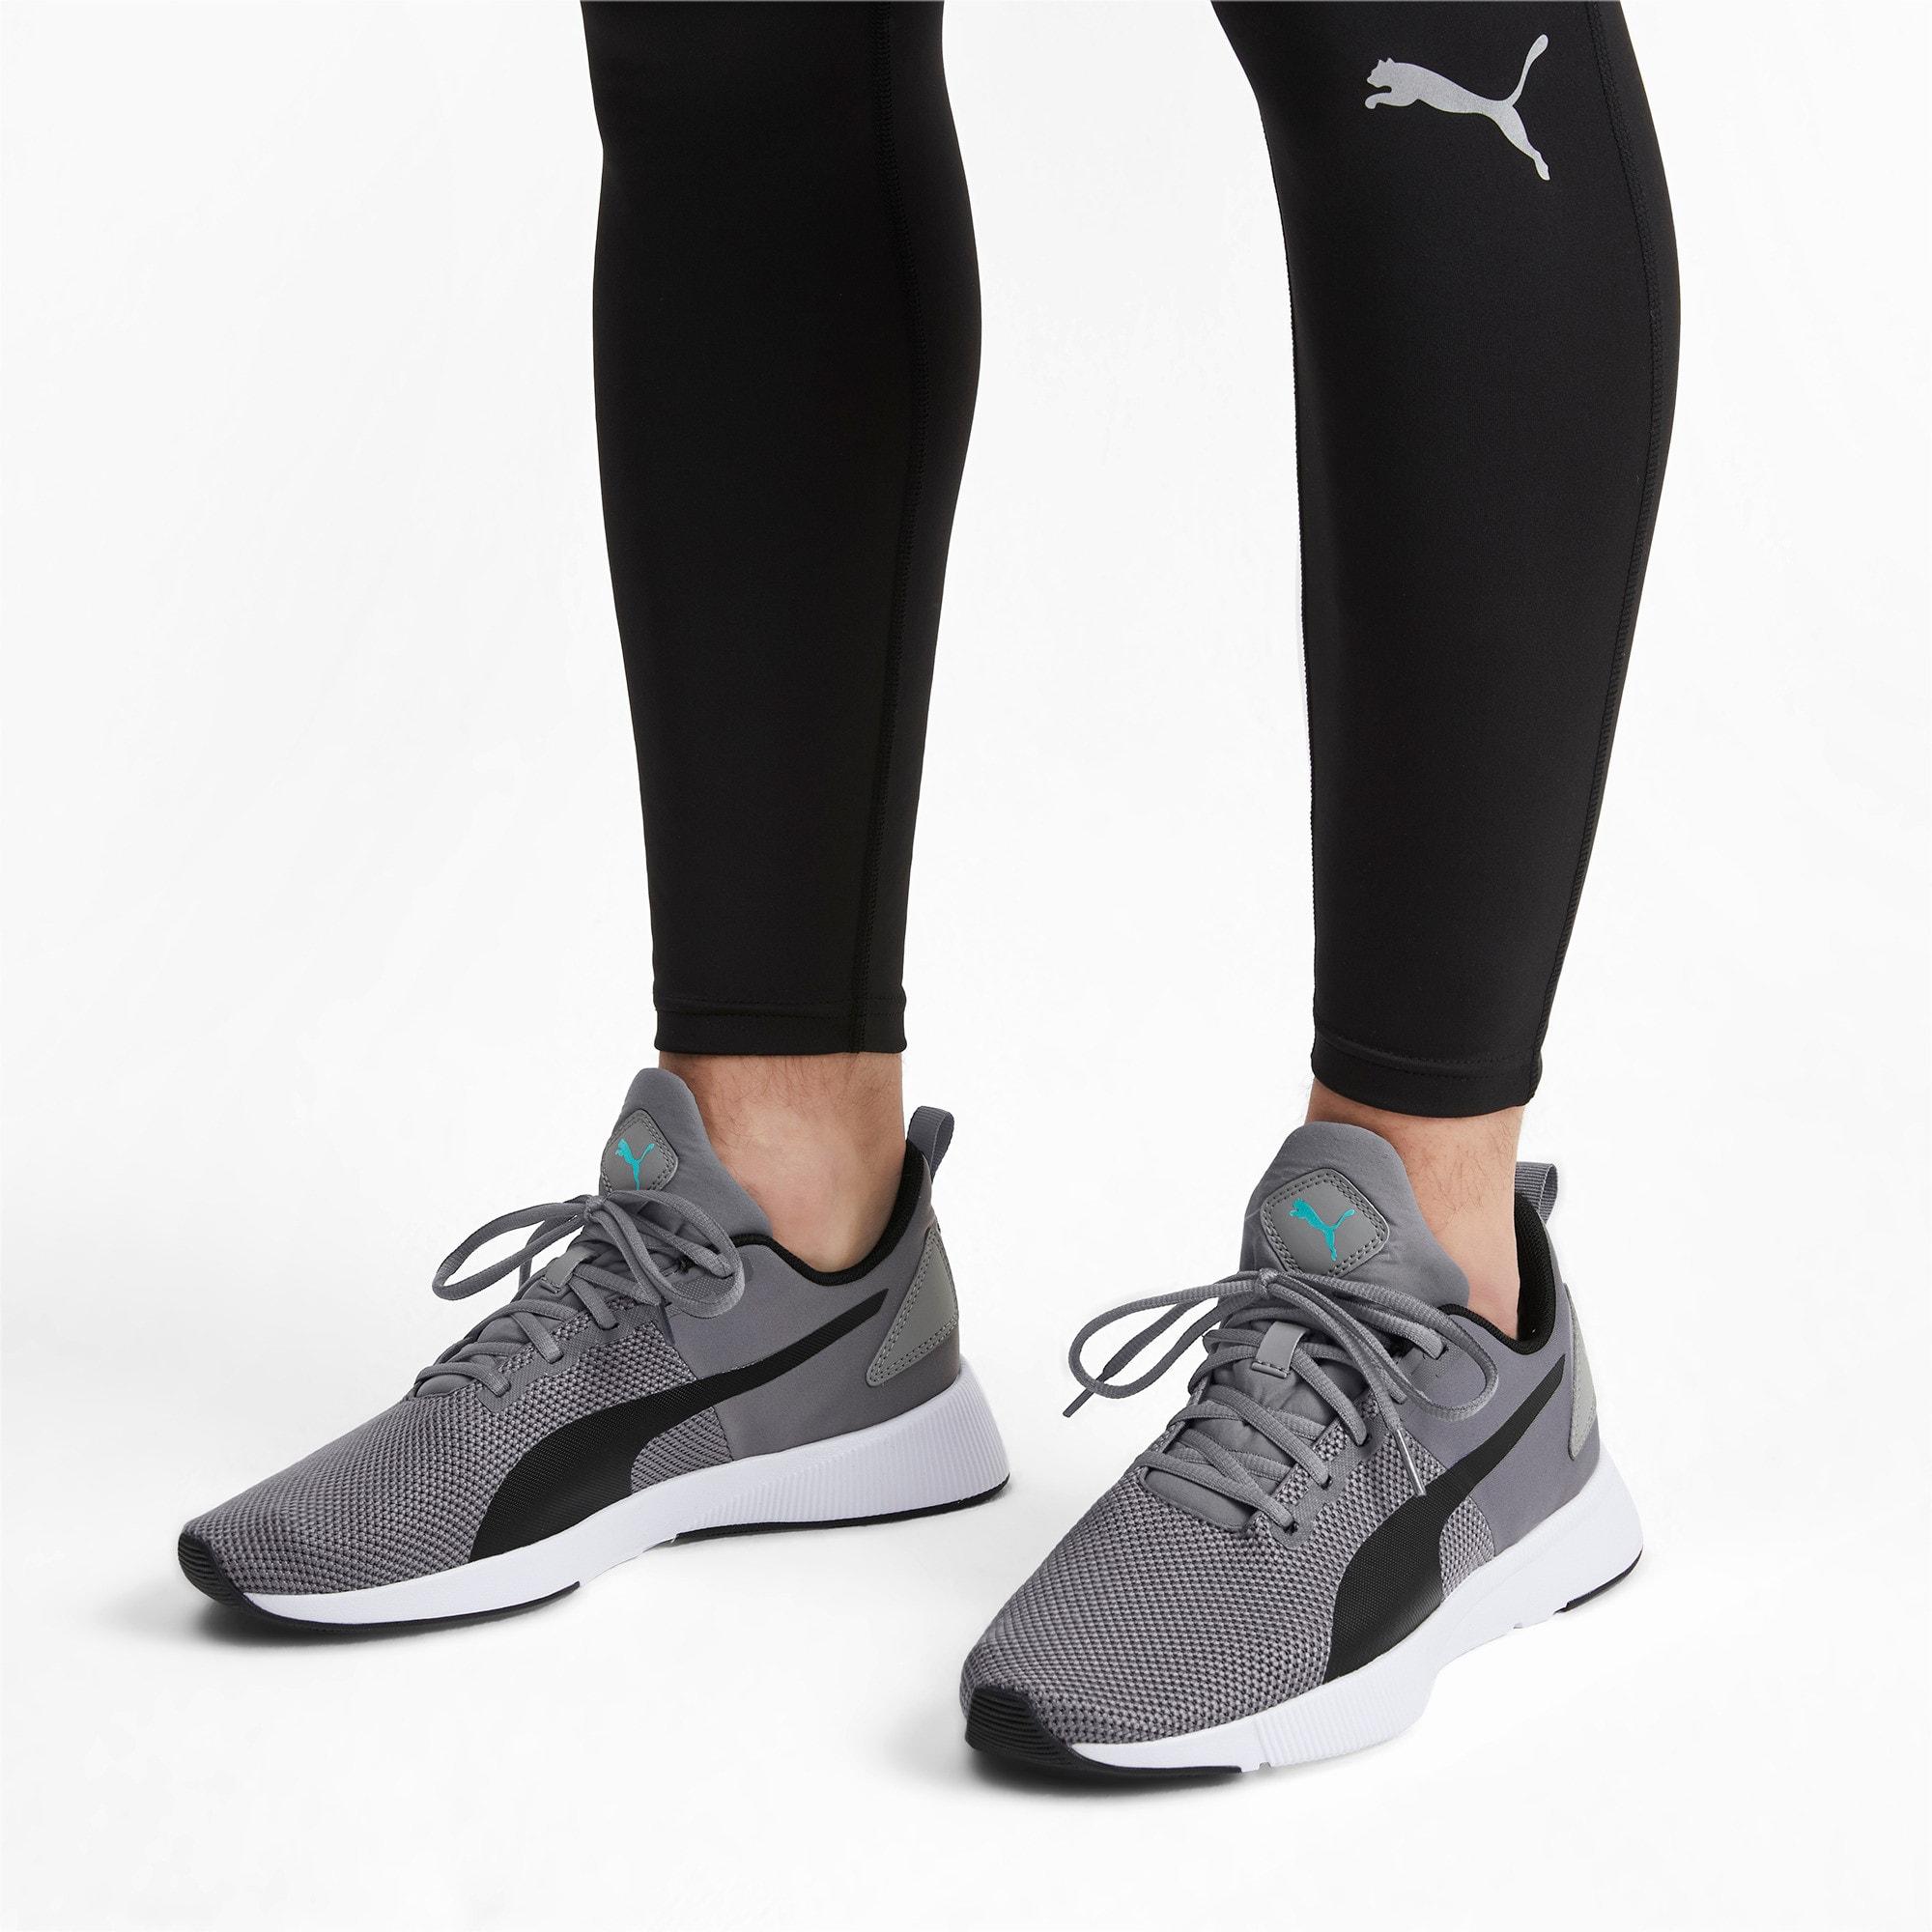 Thumbnail 3 of Flyer Runner Running Shoes, Charcoal-Black-Turquoise, medium